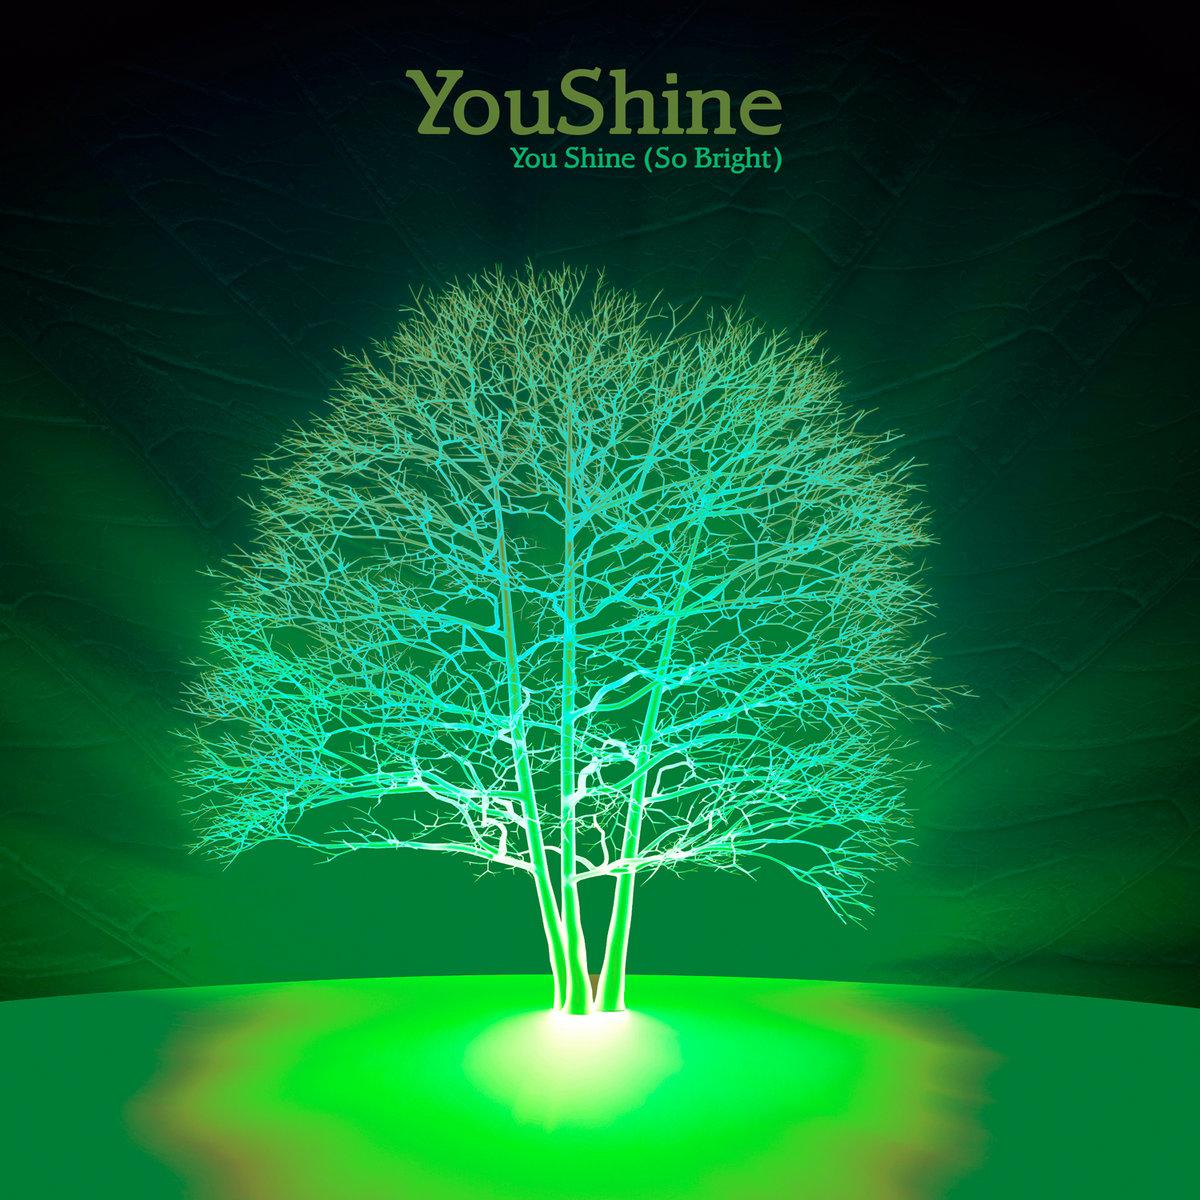 You Shine (So Bright) | The Hypnotic LFO Room